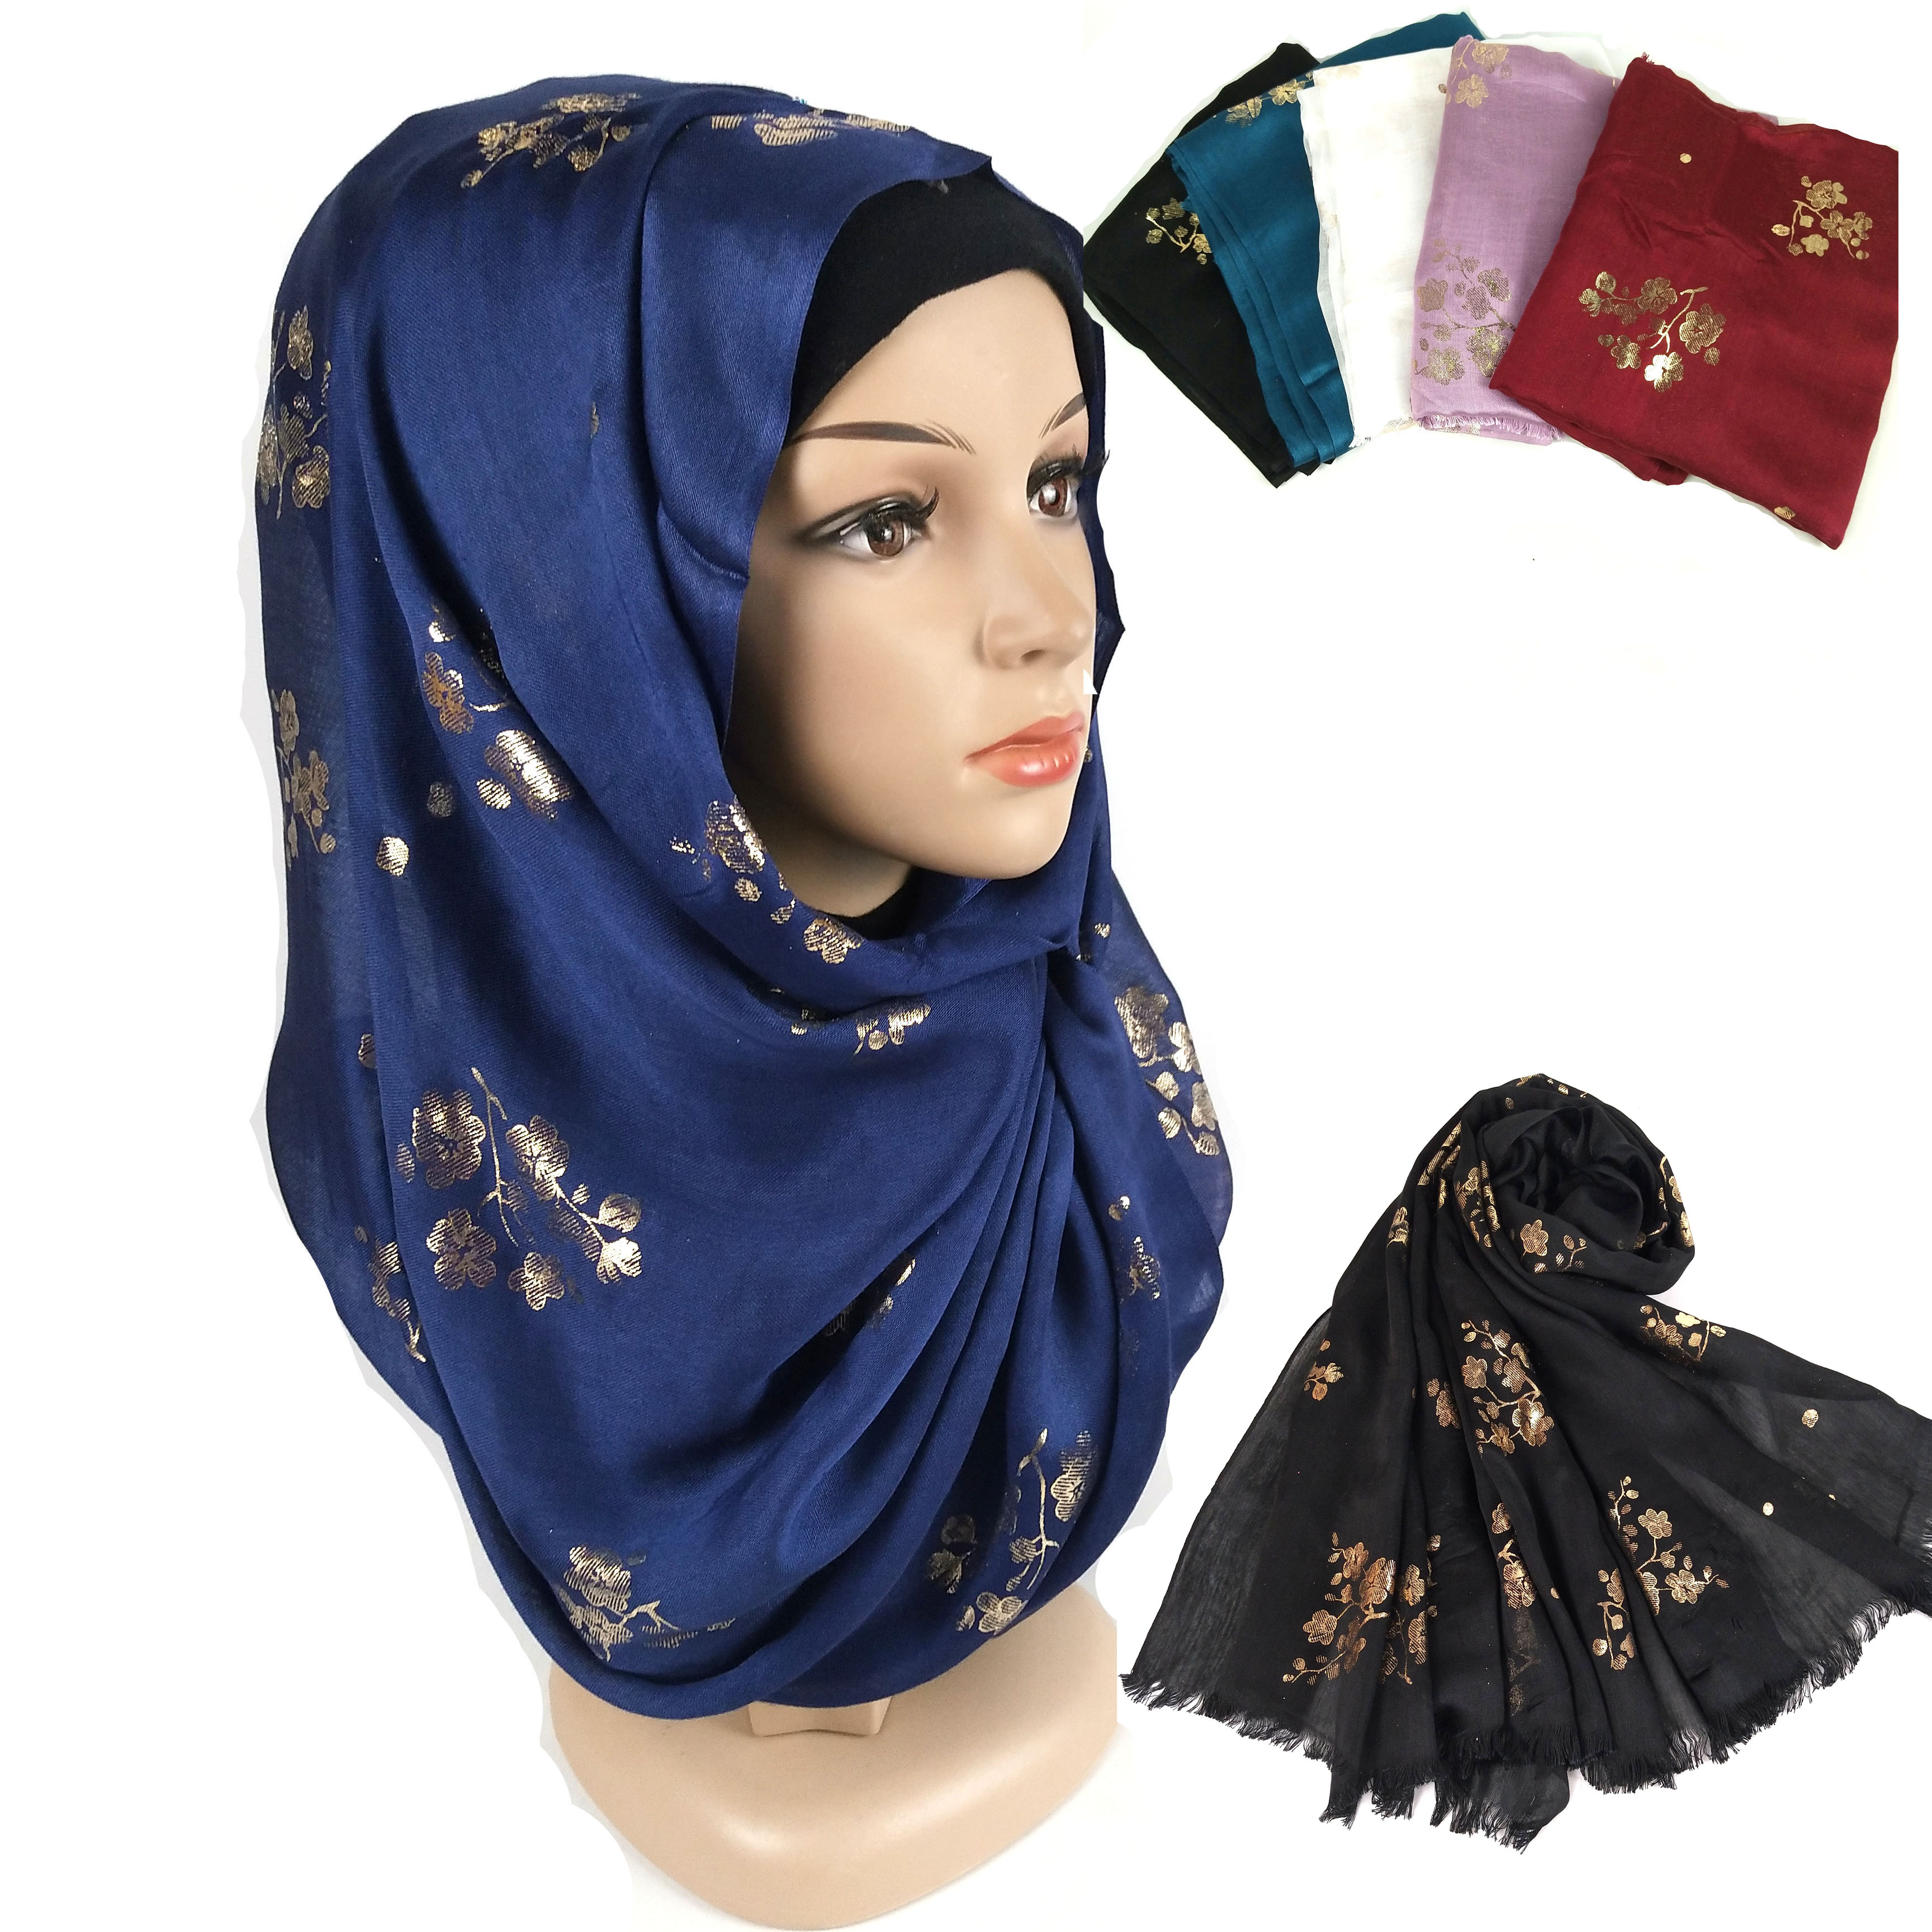 K9 10pcs High Quality Flower Printed Cotton Viscose Hijab Shawl Scarf/scarf Crinkle  Women Wrap Headband Can Choose Colors